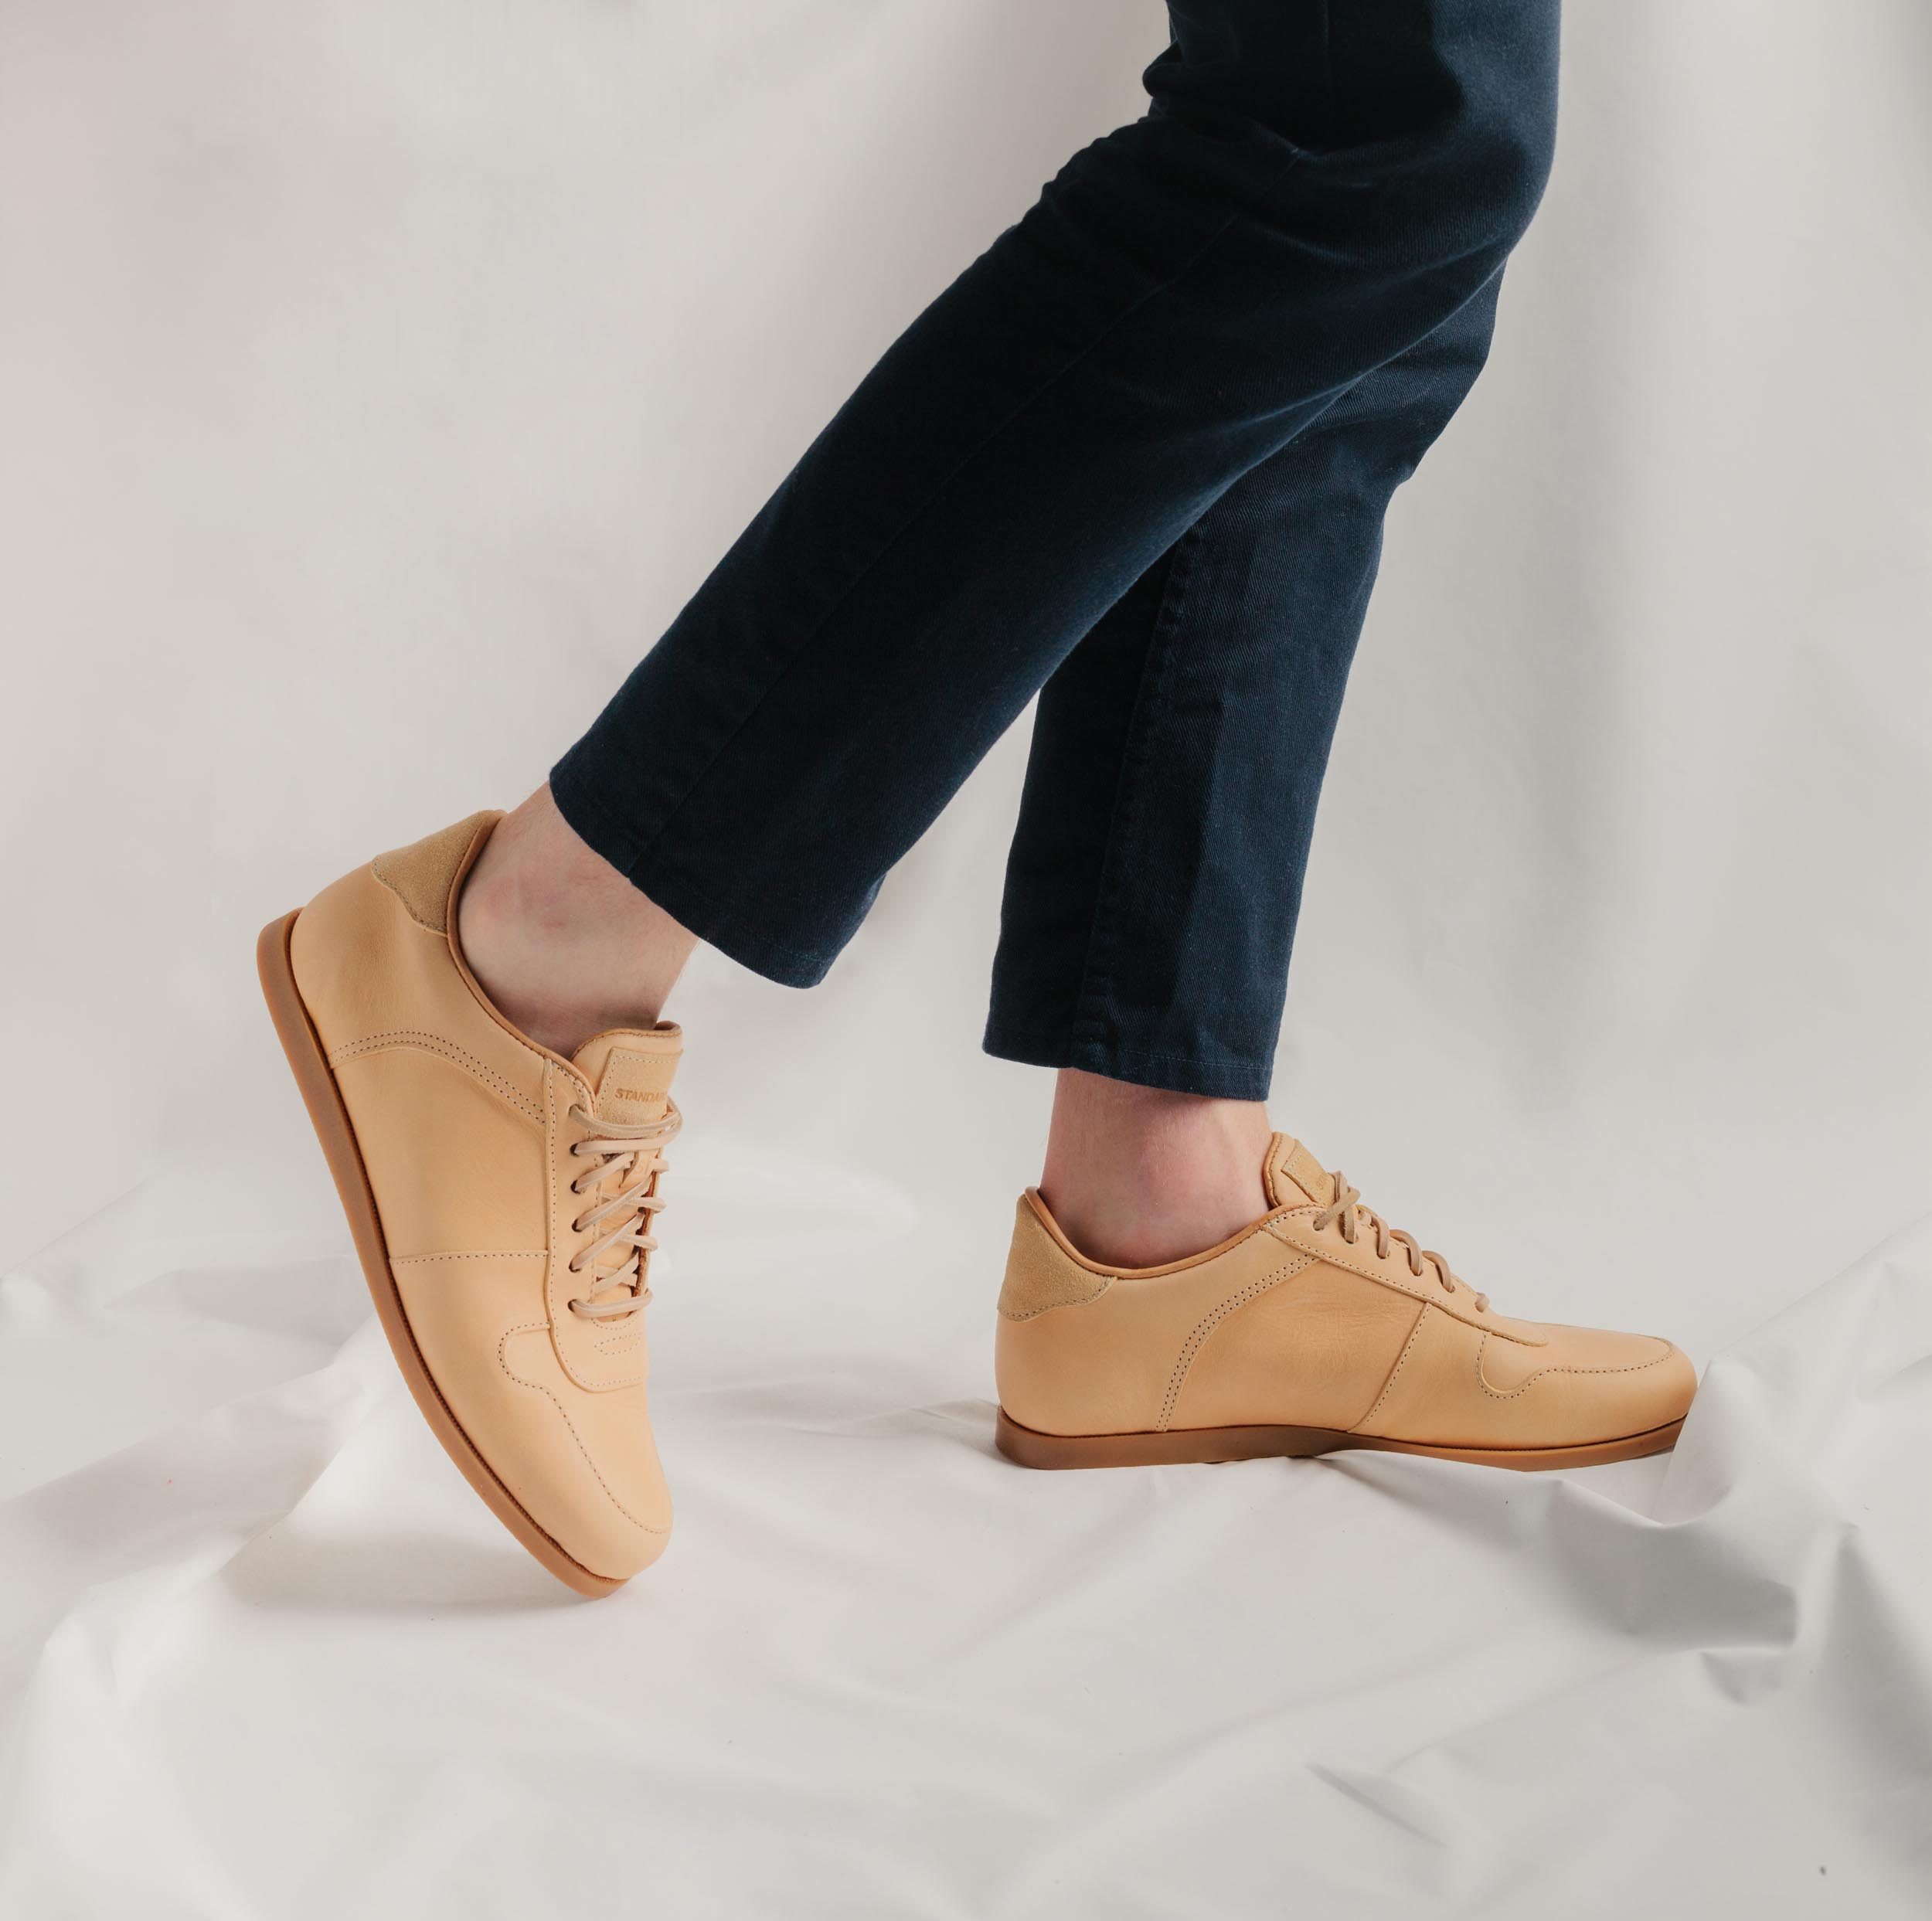 honey-on-foot-profile